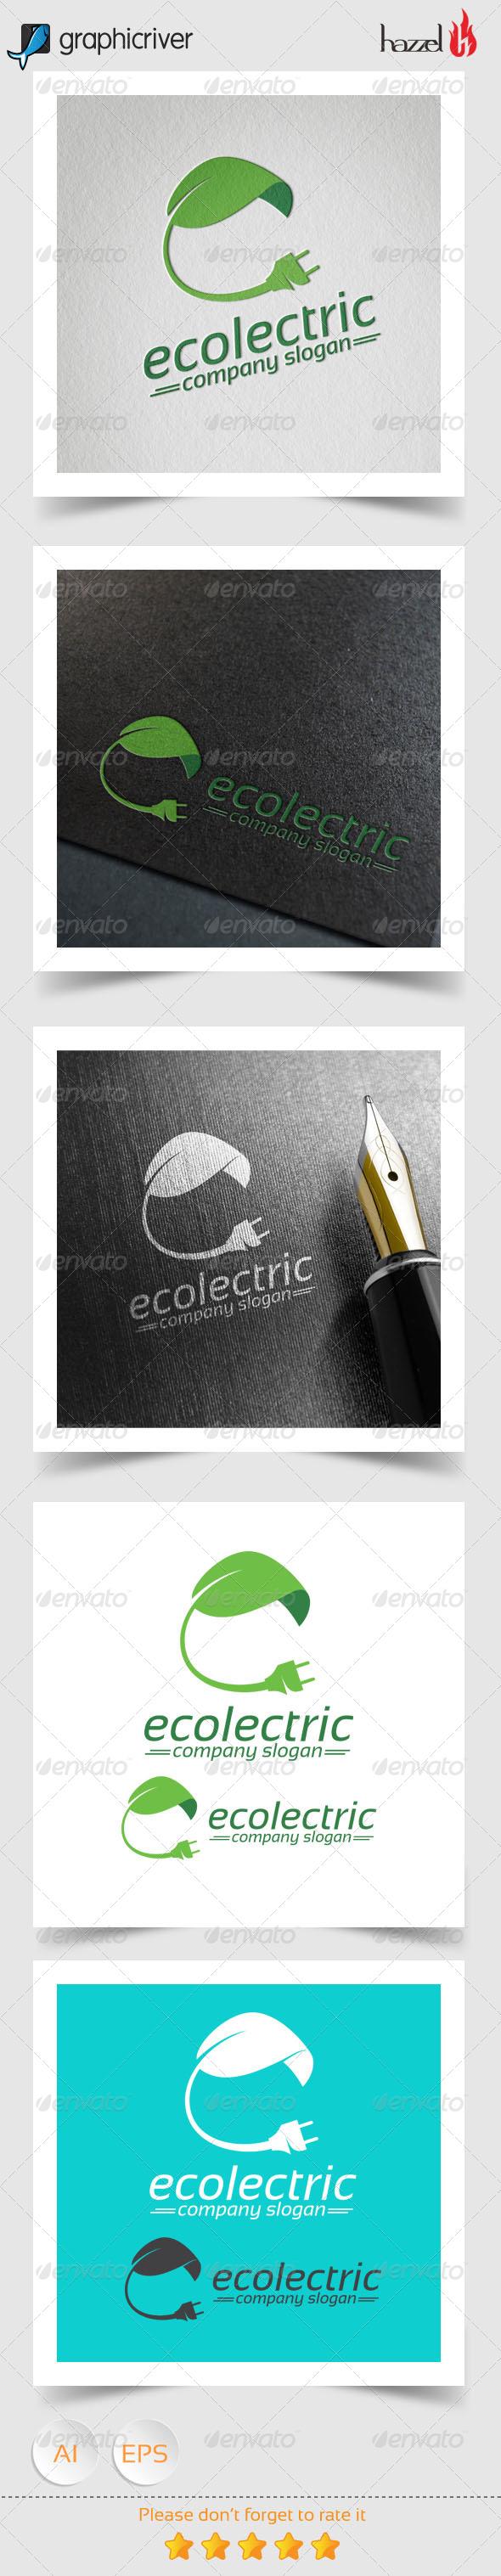 Ecolectric Logo